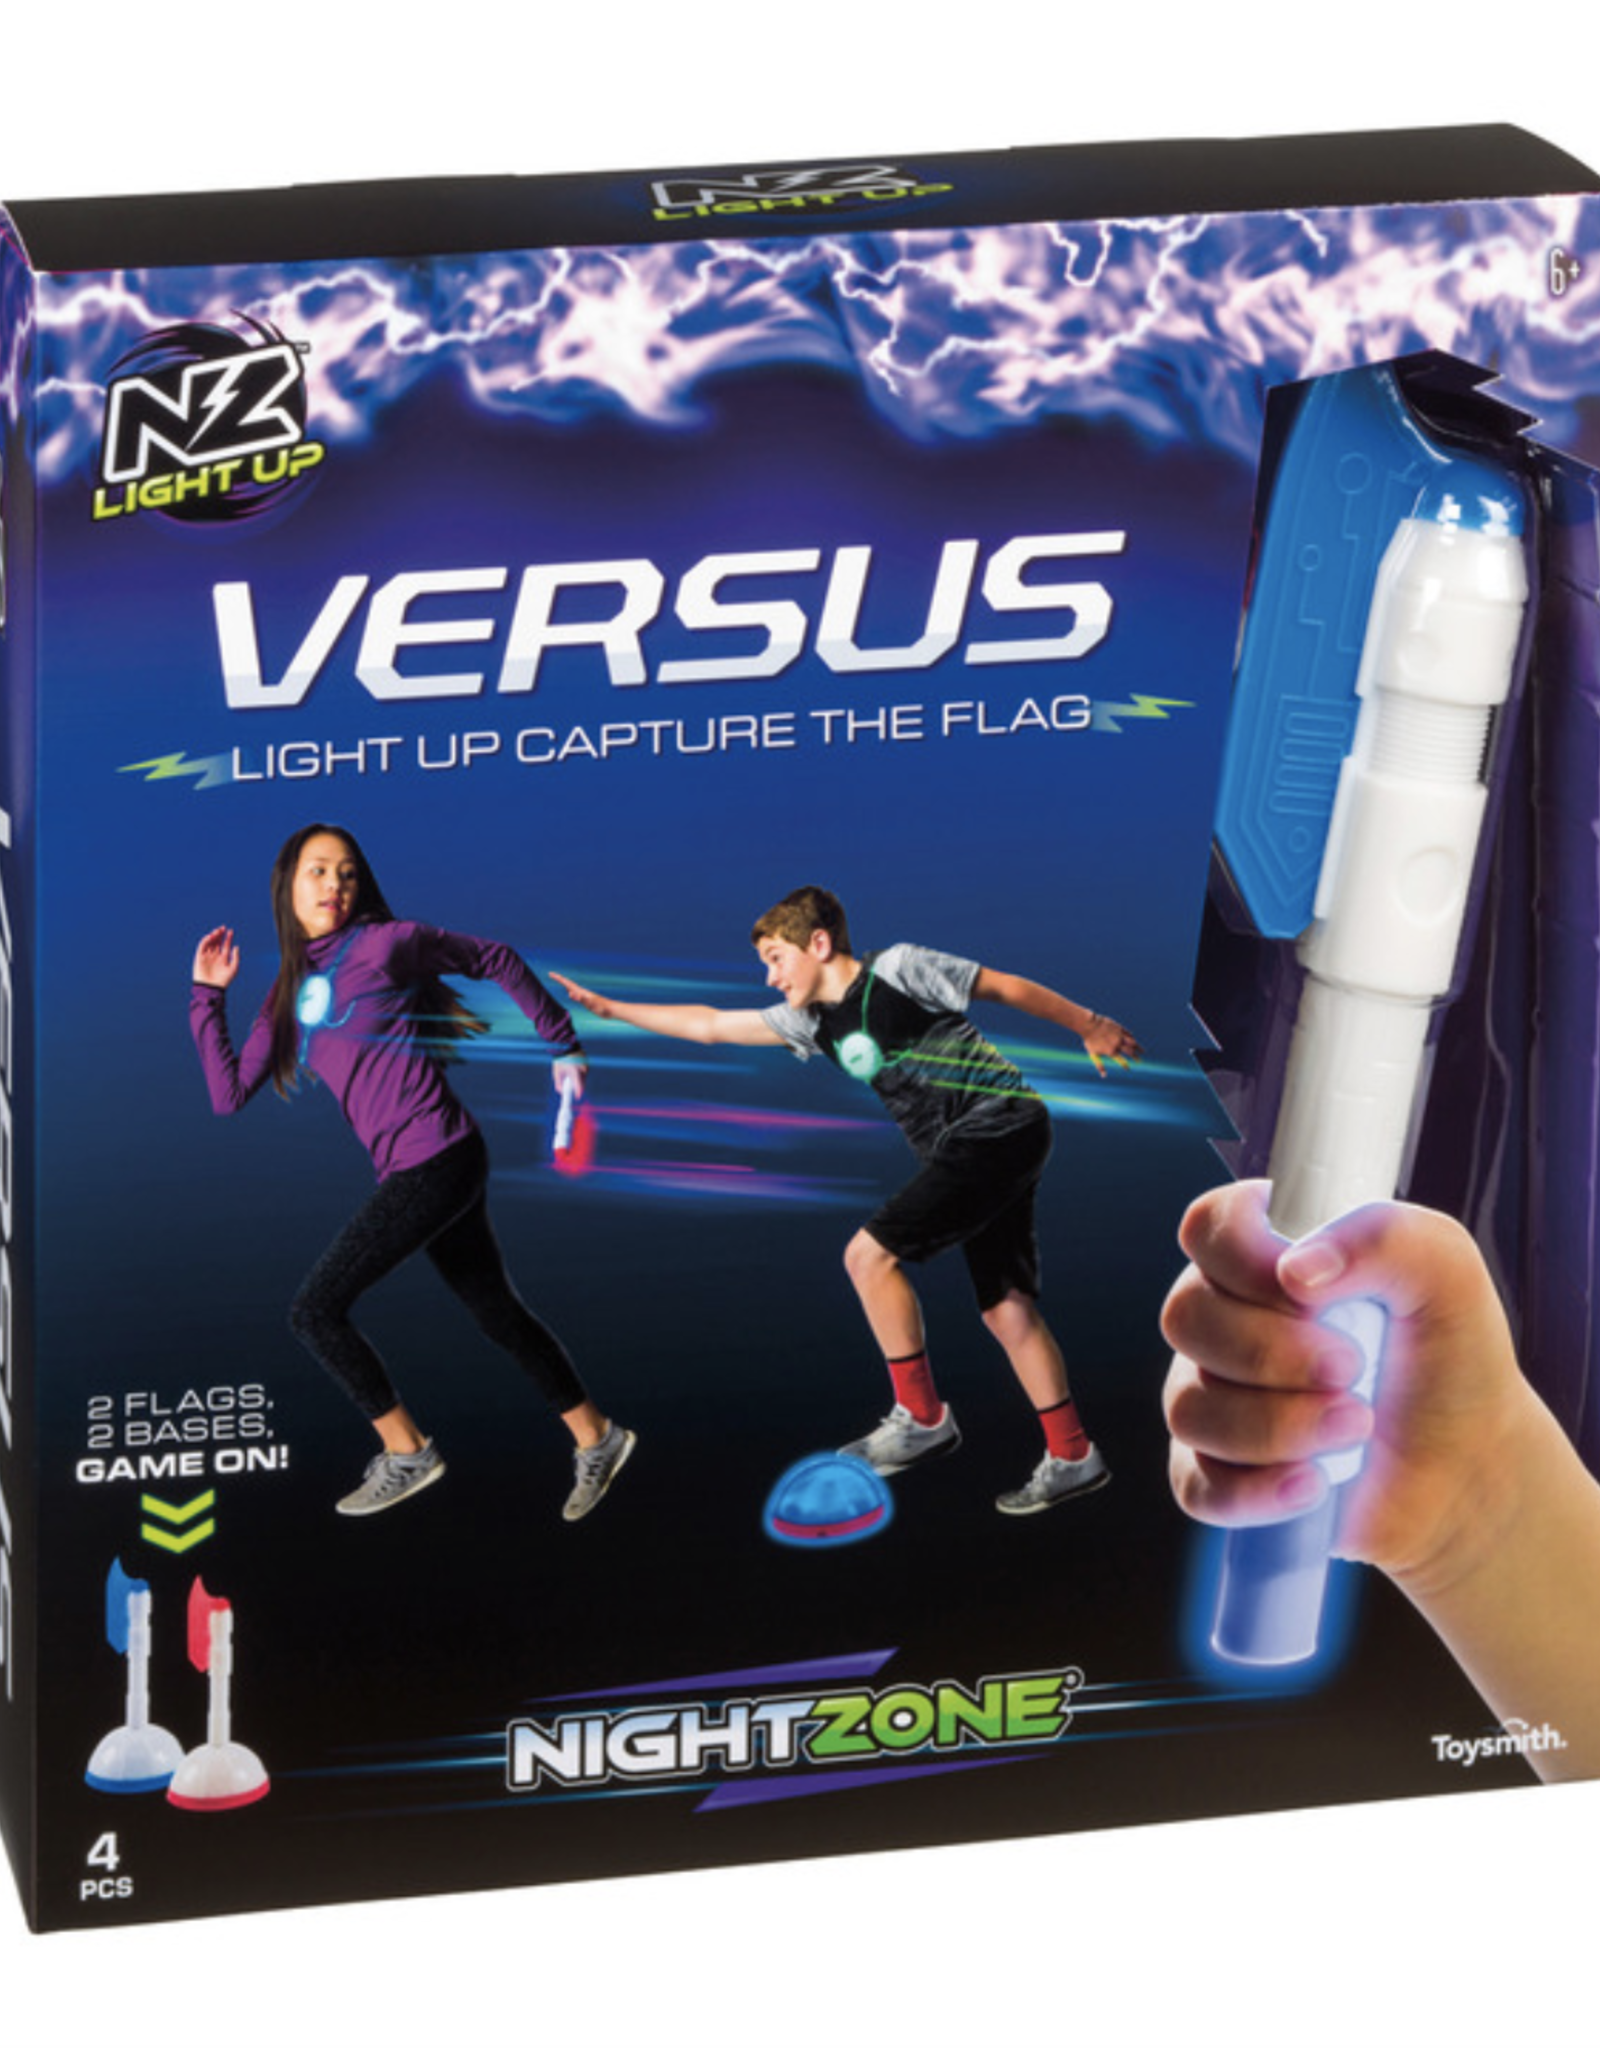 NightZone NightZone Versus Capture The Flag